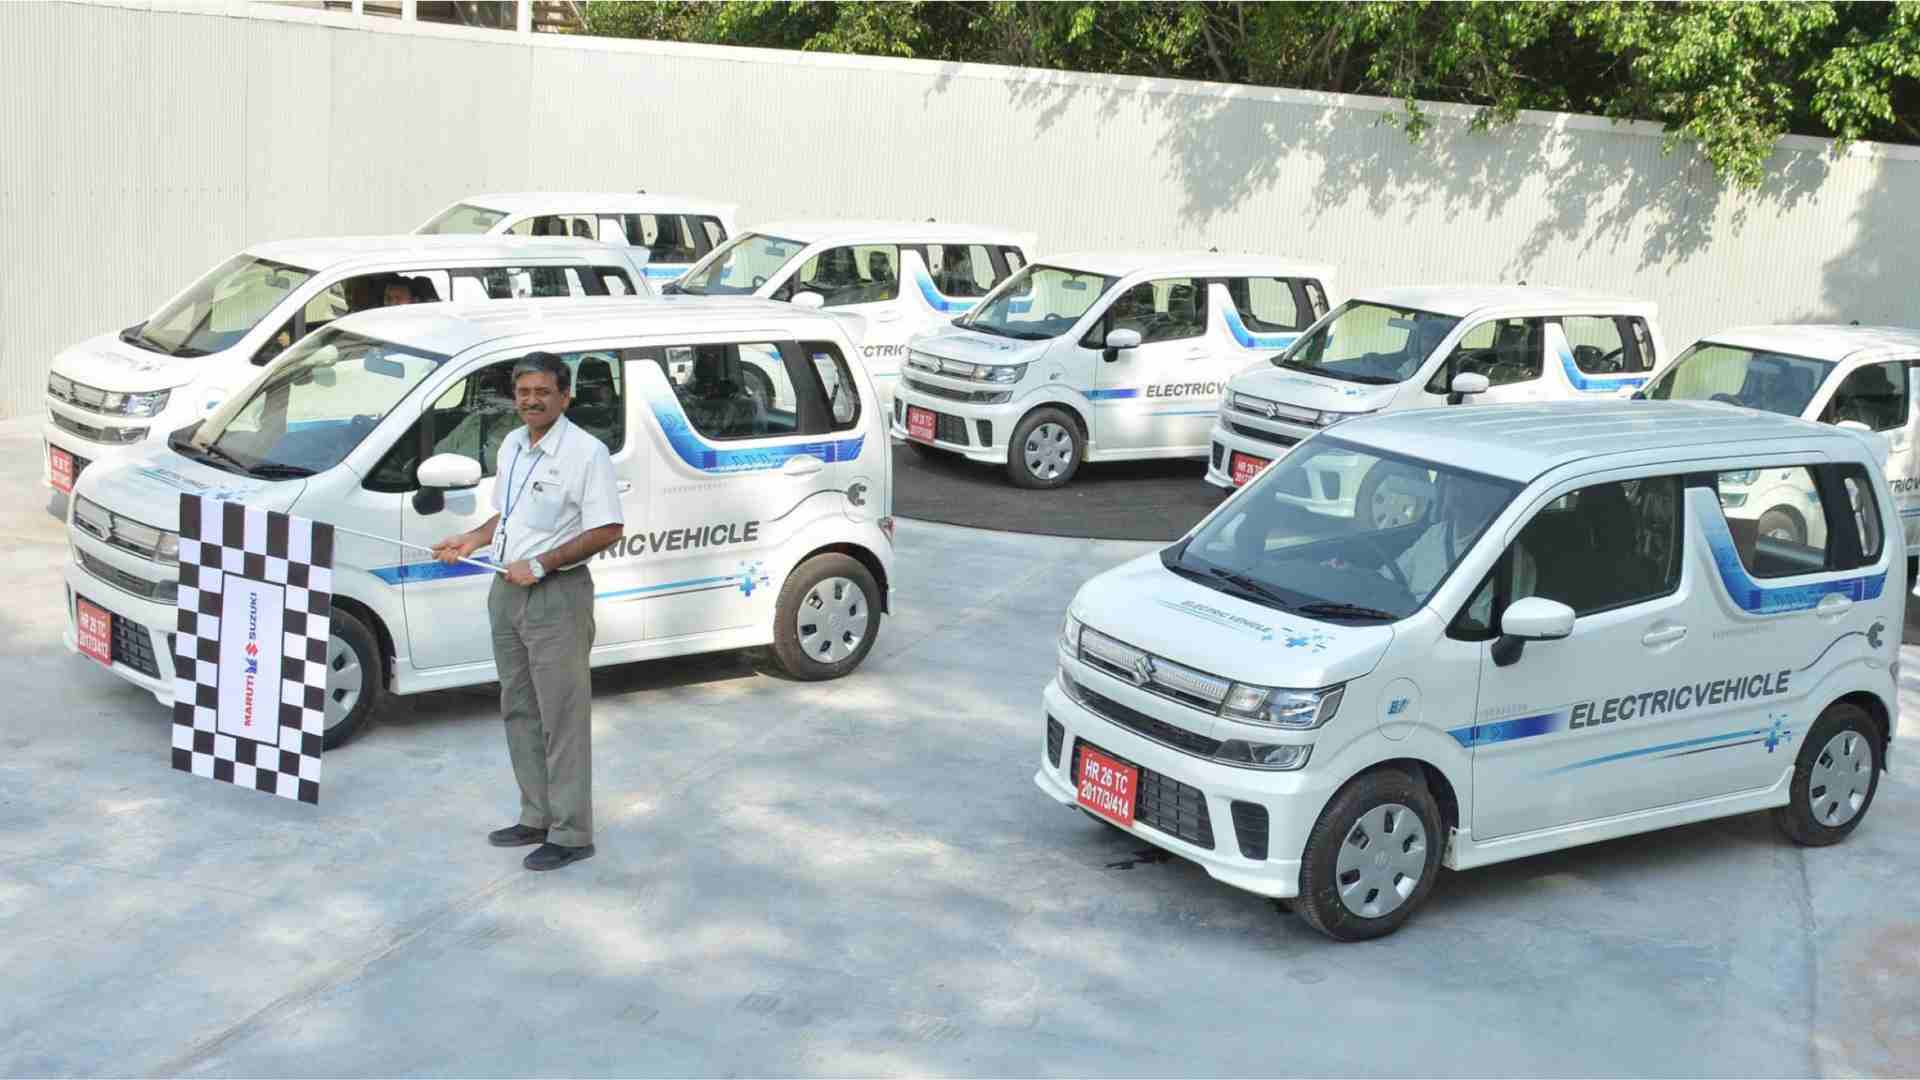 Maruti Suzuki had started fleet testing of electric cars in 2018. Photo: Maruti Suzuki